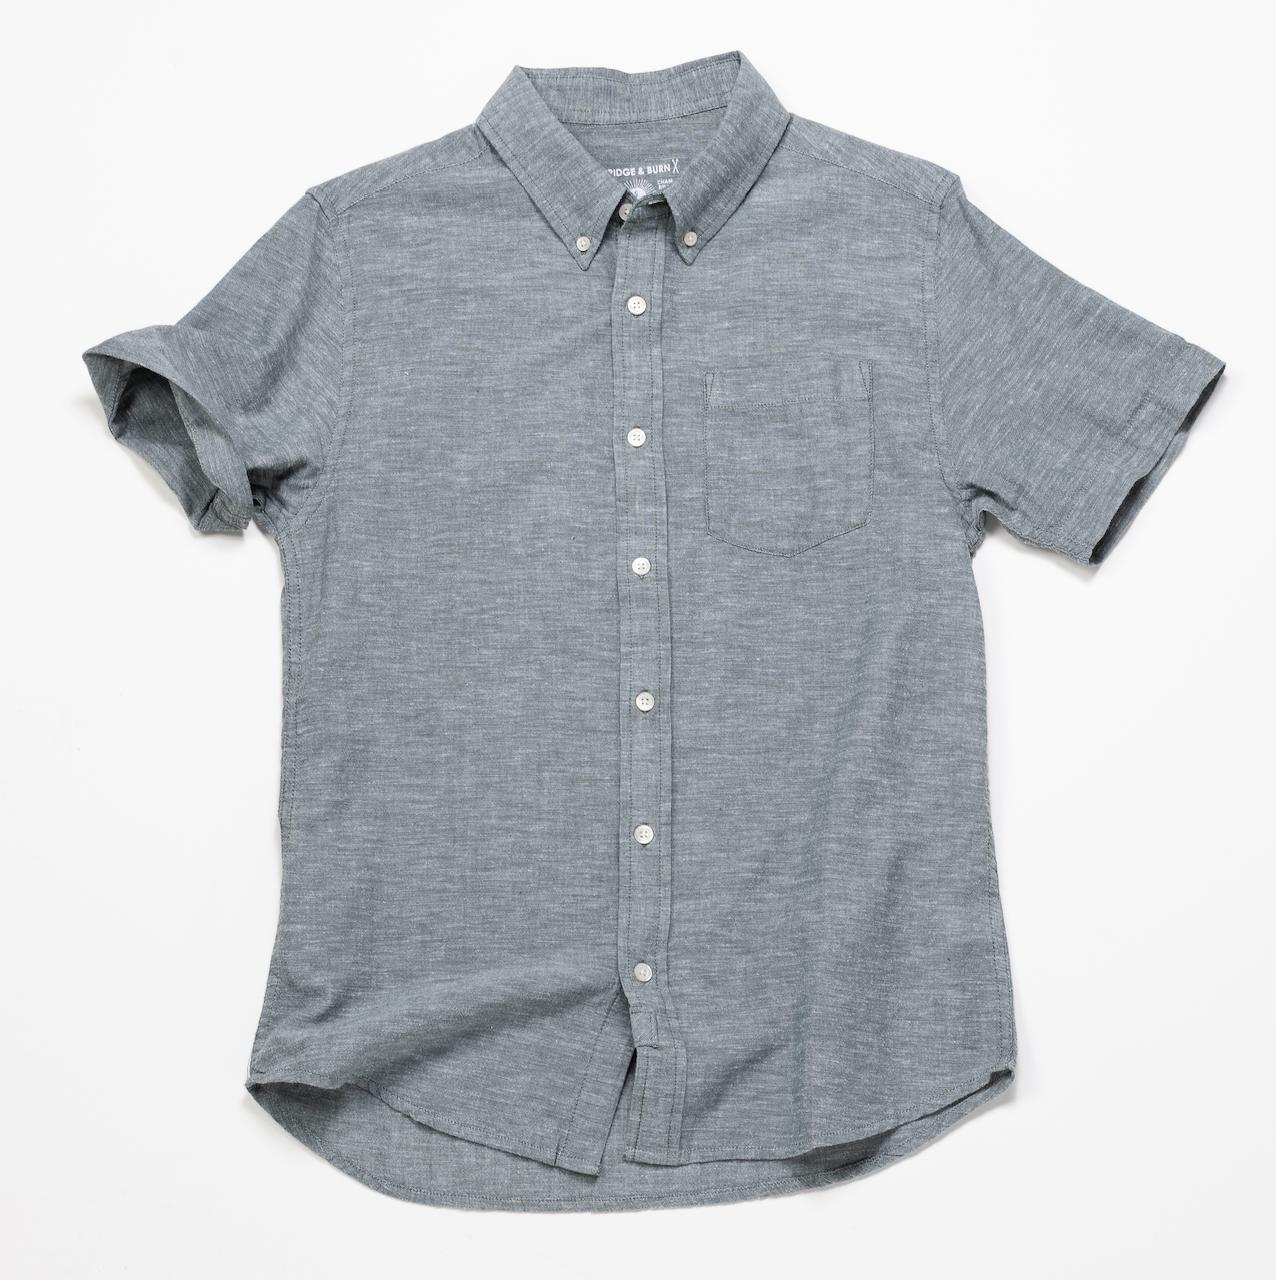 Short Sleeve Chambray Shirt – Spruce